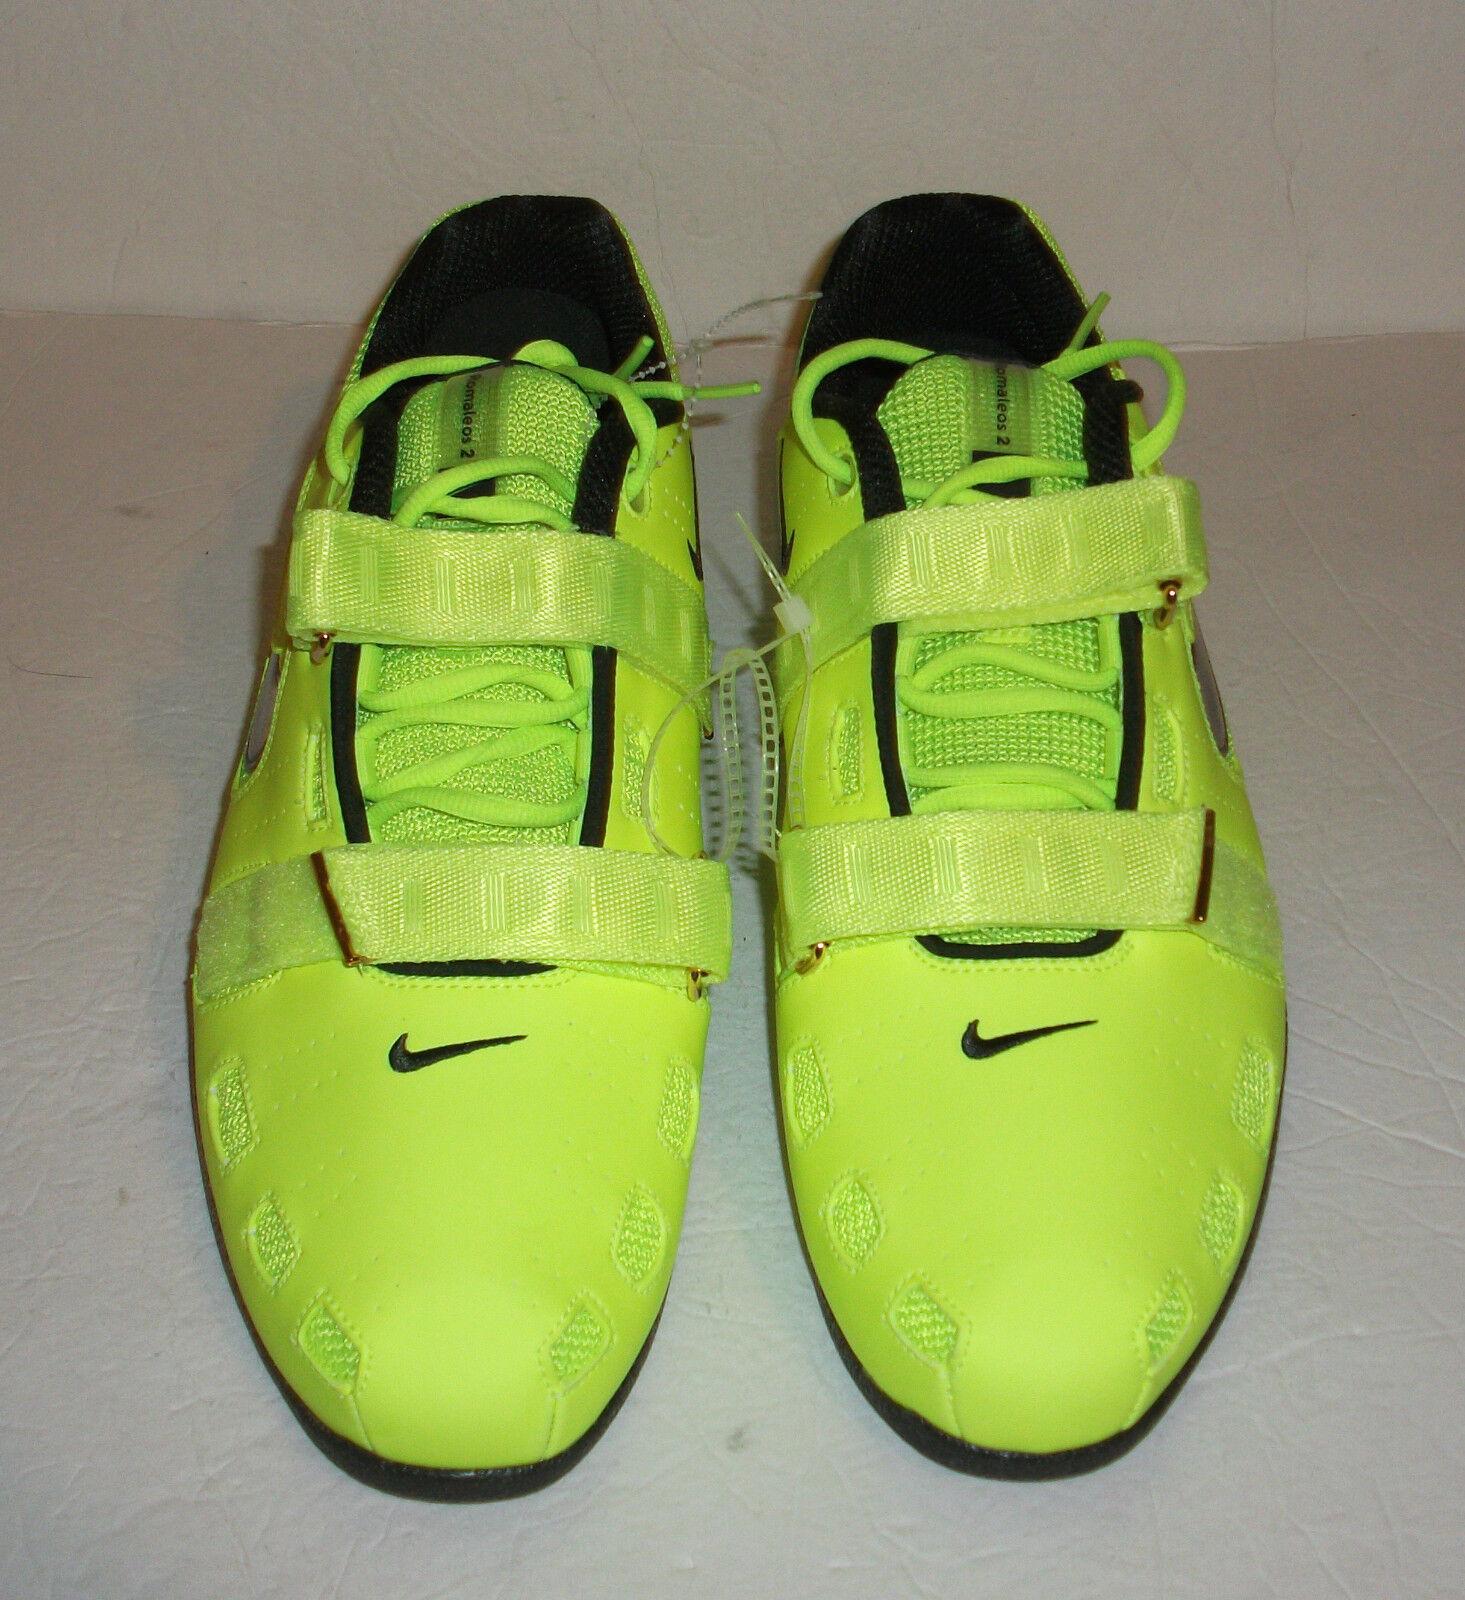 New Nike Romaleos II 2 Mens Power Lifting, Multi Size, Volt, 476927-700